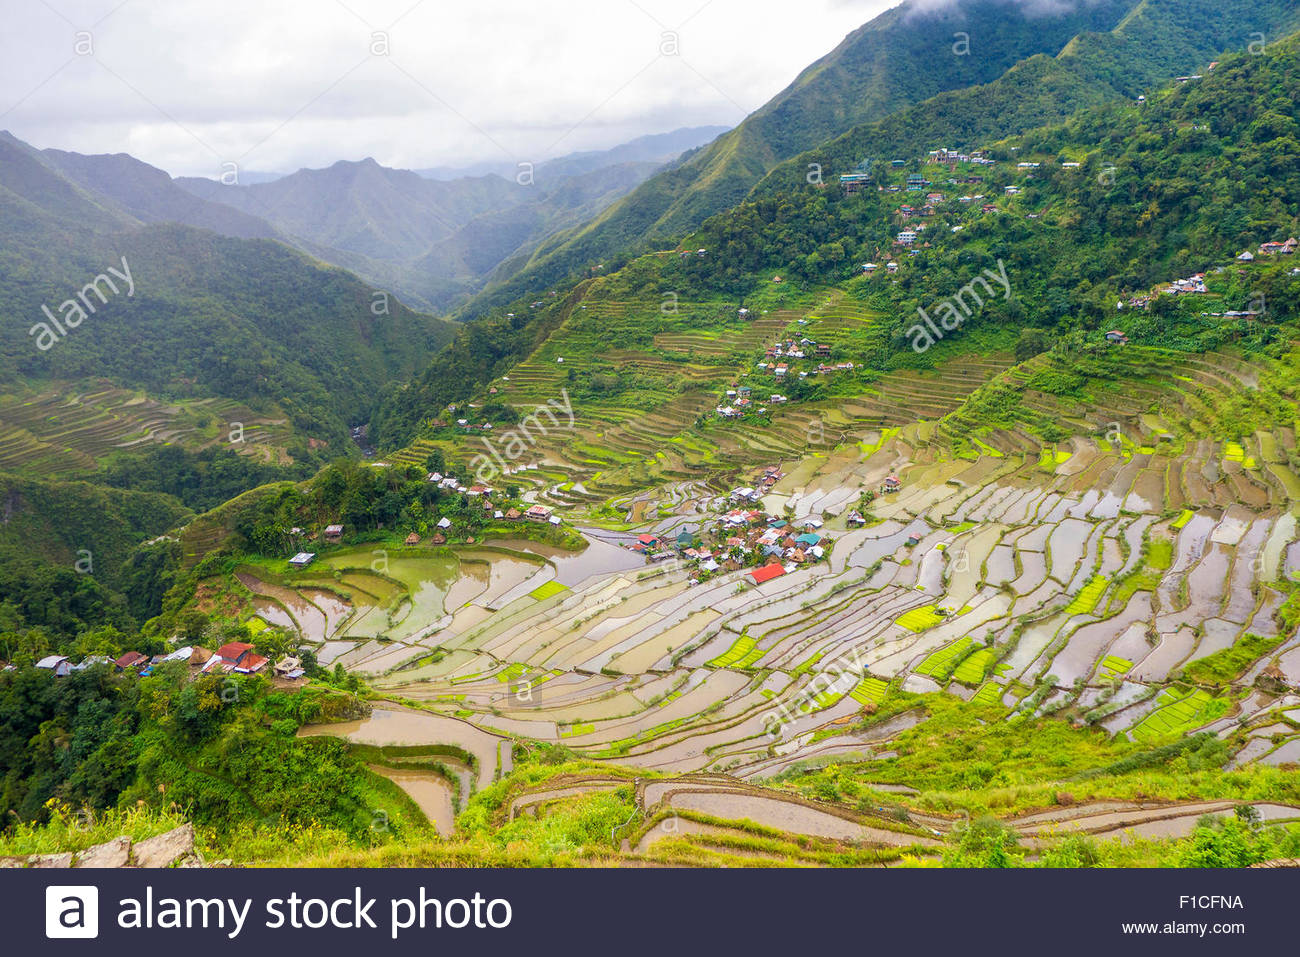 Batad rice terraces and village, Banaue, Mountain Province, Cordillera Administrative Region, Philippines - Stock Image